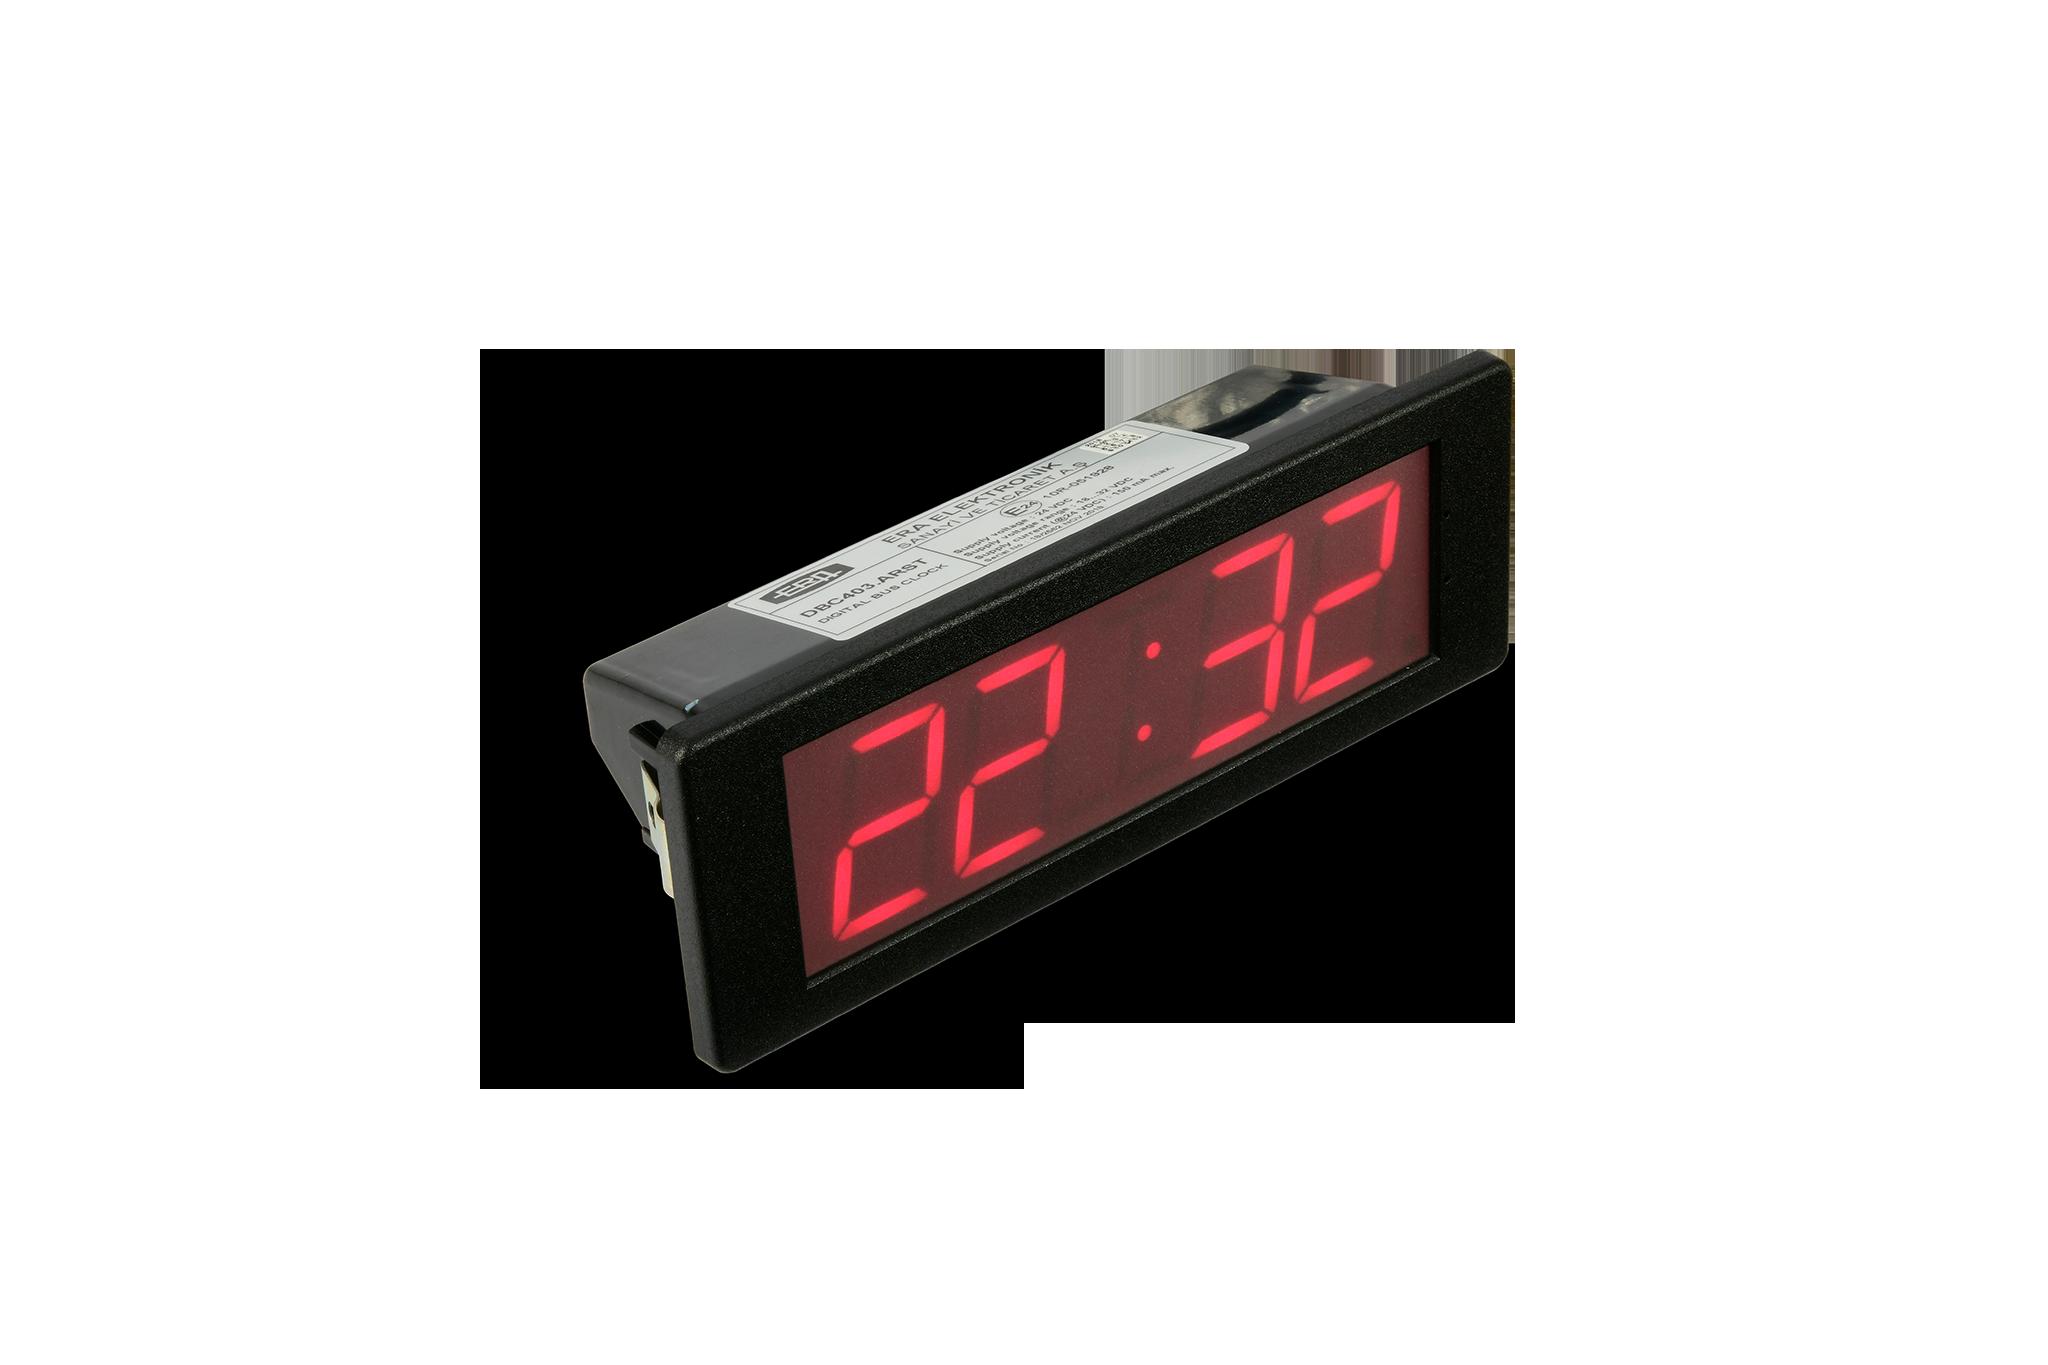 DIGITAL BUS CLOCK